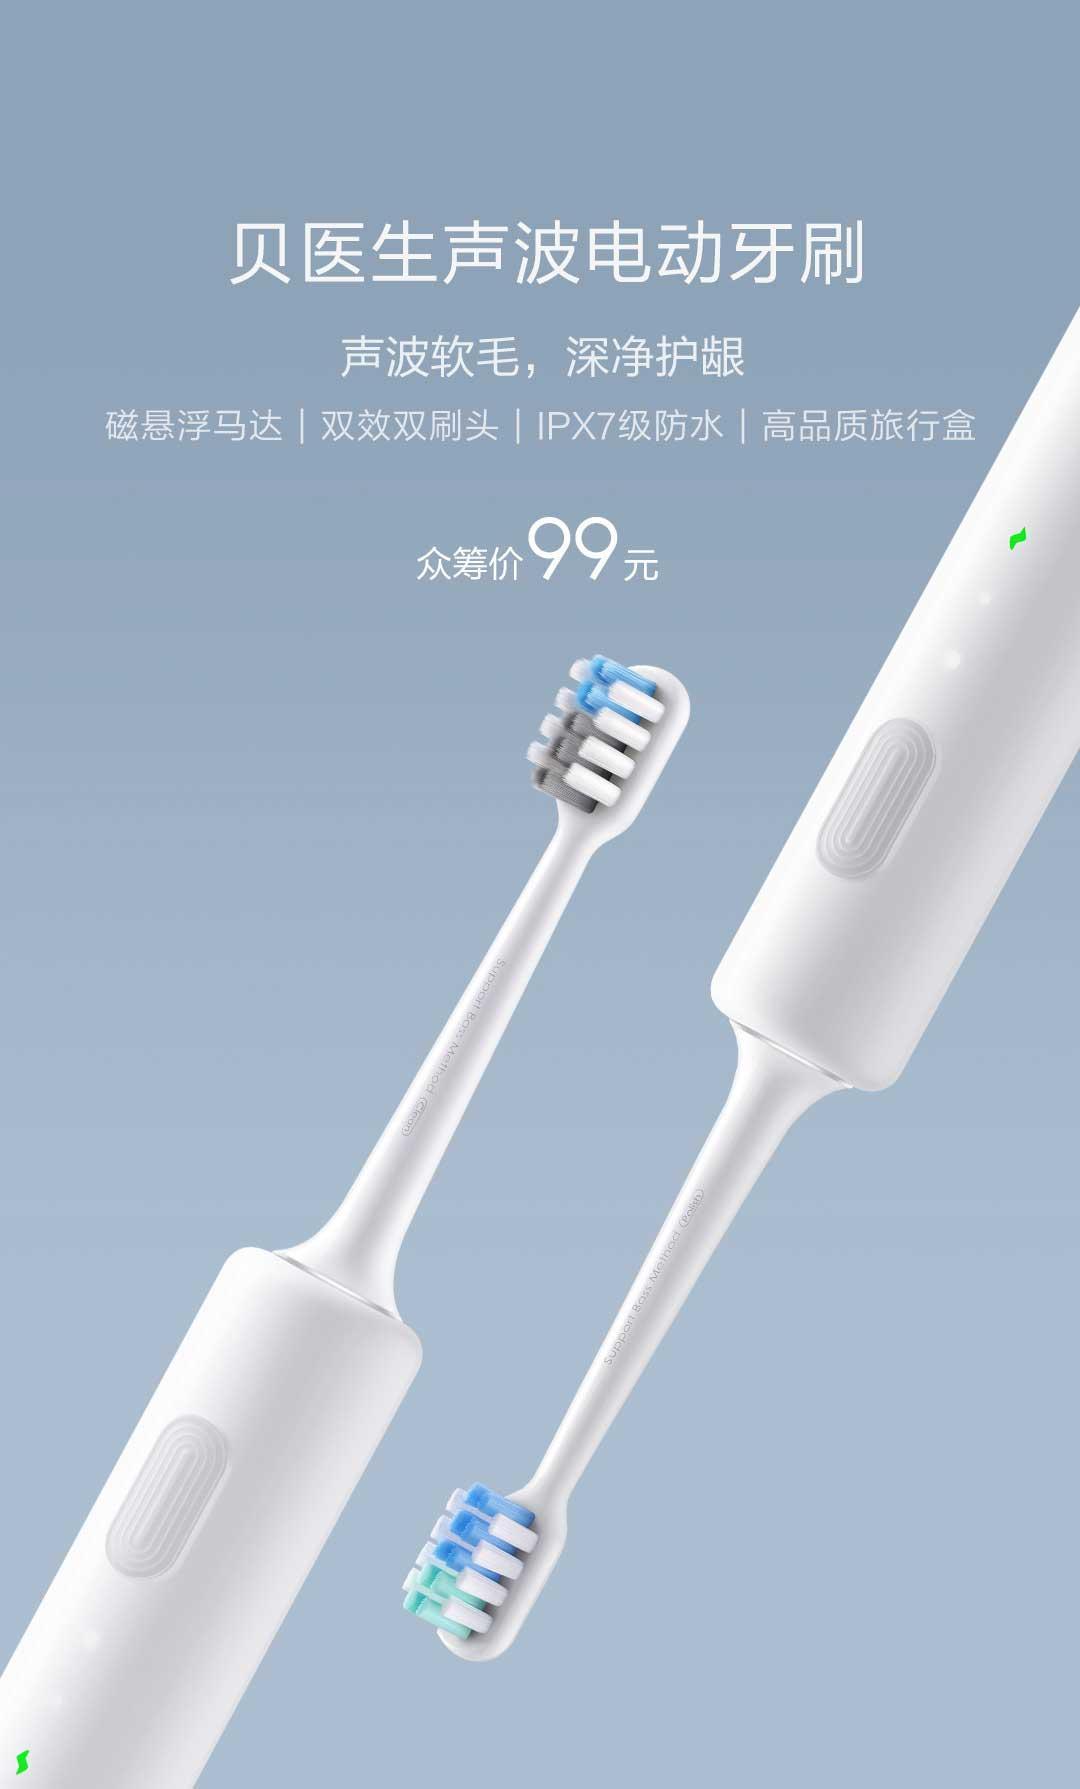 xiaomi cepillo electrico